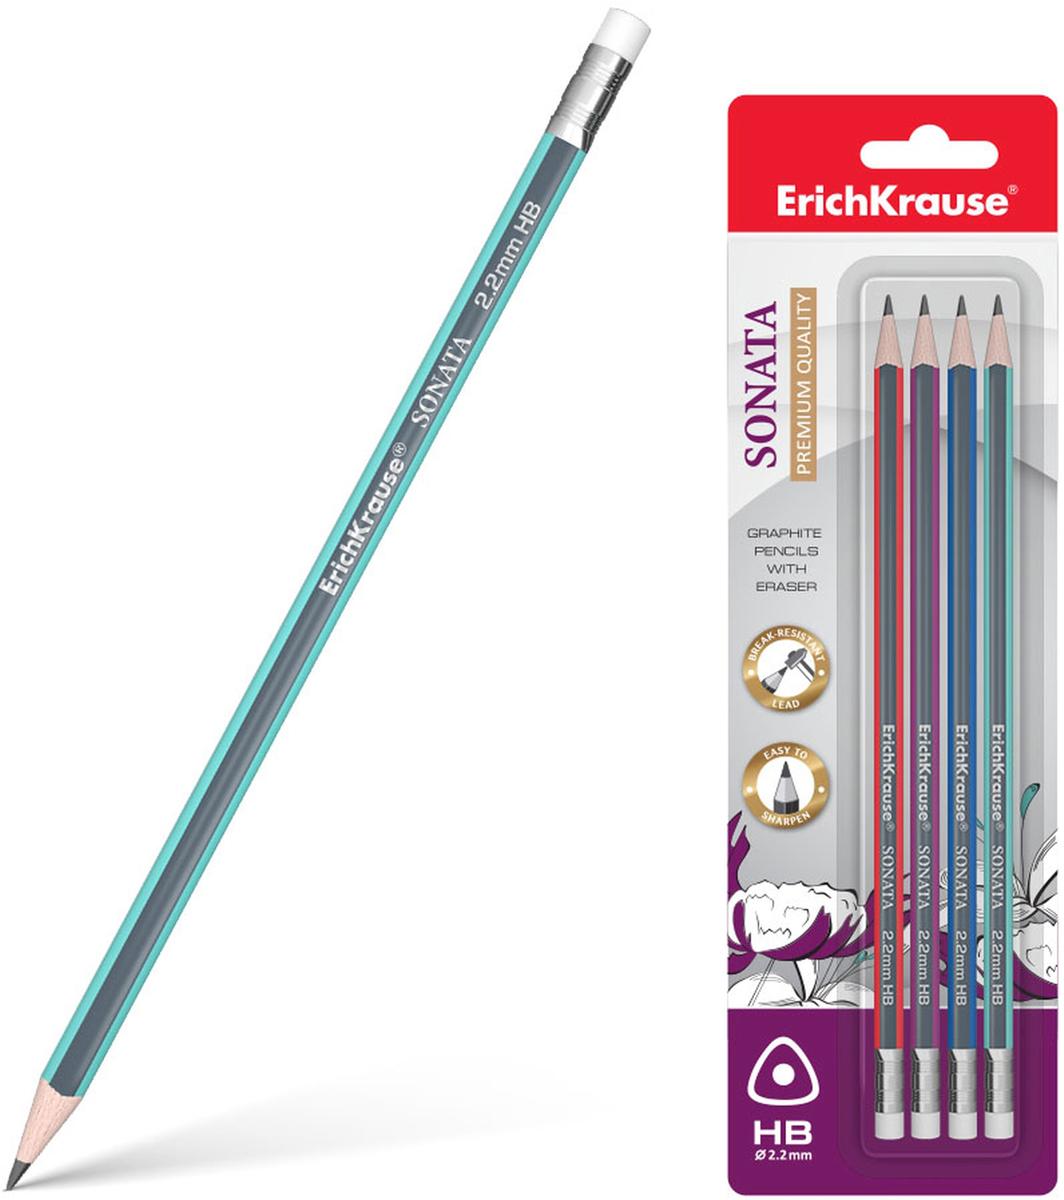 цена на Чернографитный карандаш ErichKrause Sonata,трехгранный, с ластиком, HB, 4 шт